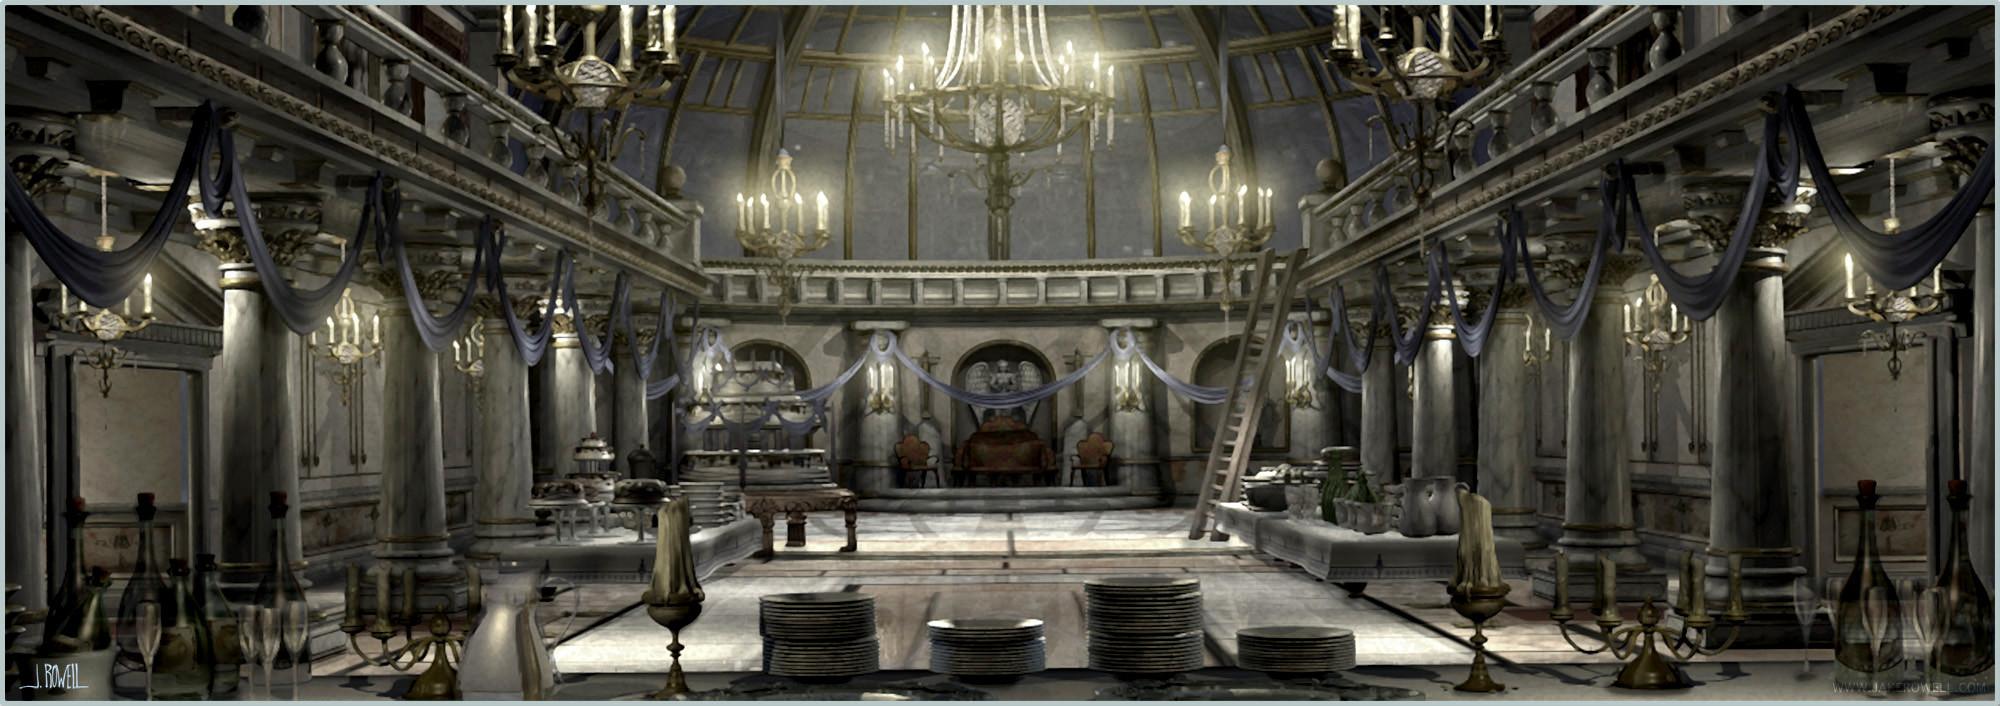 Alexandria-Castle-Banquet-Room.JPG